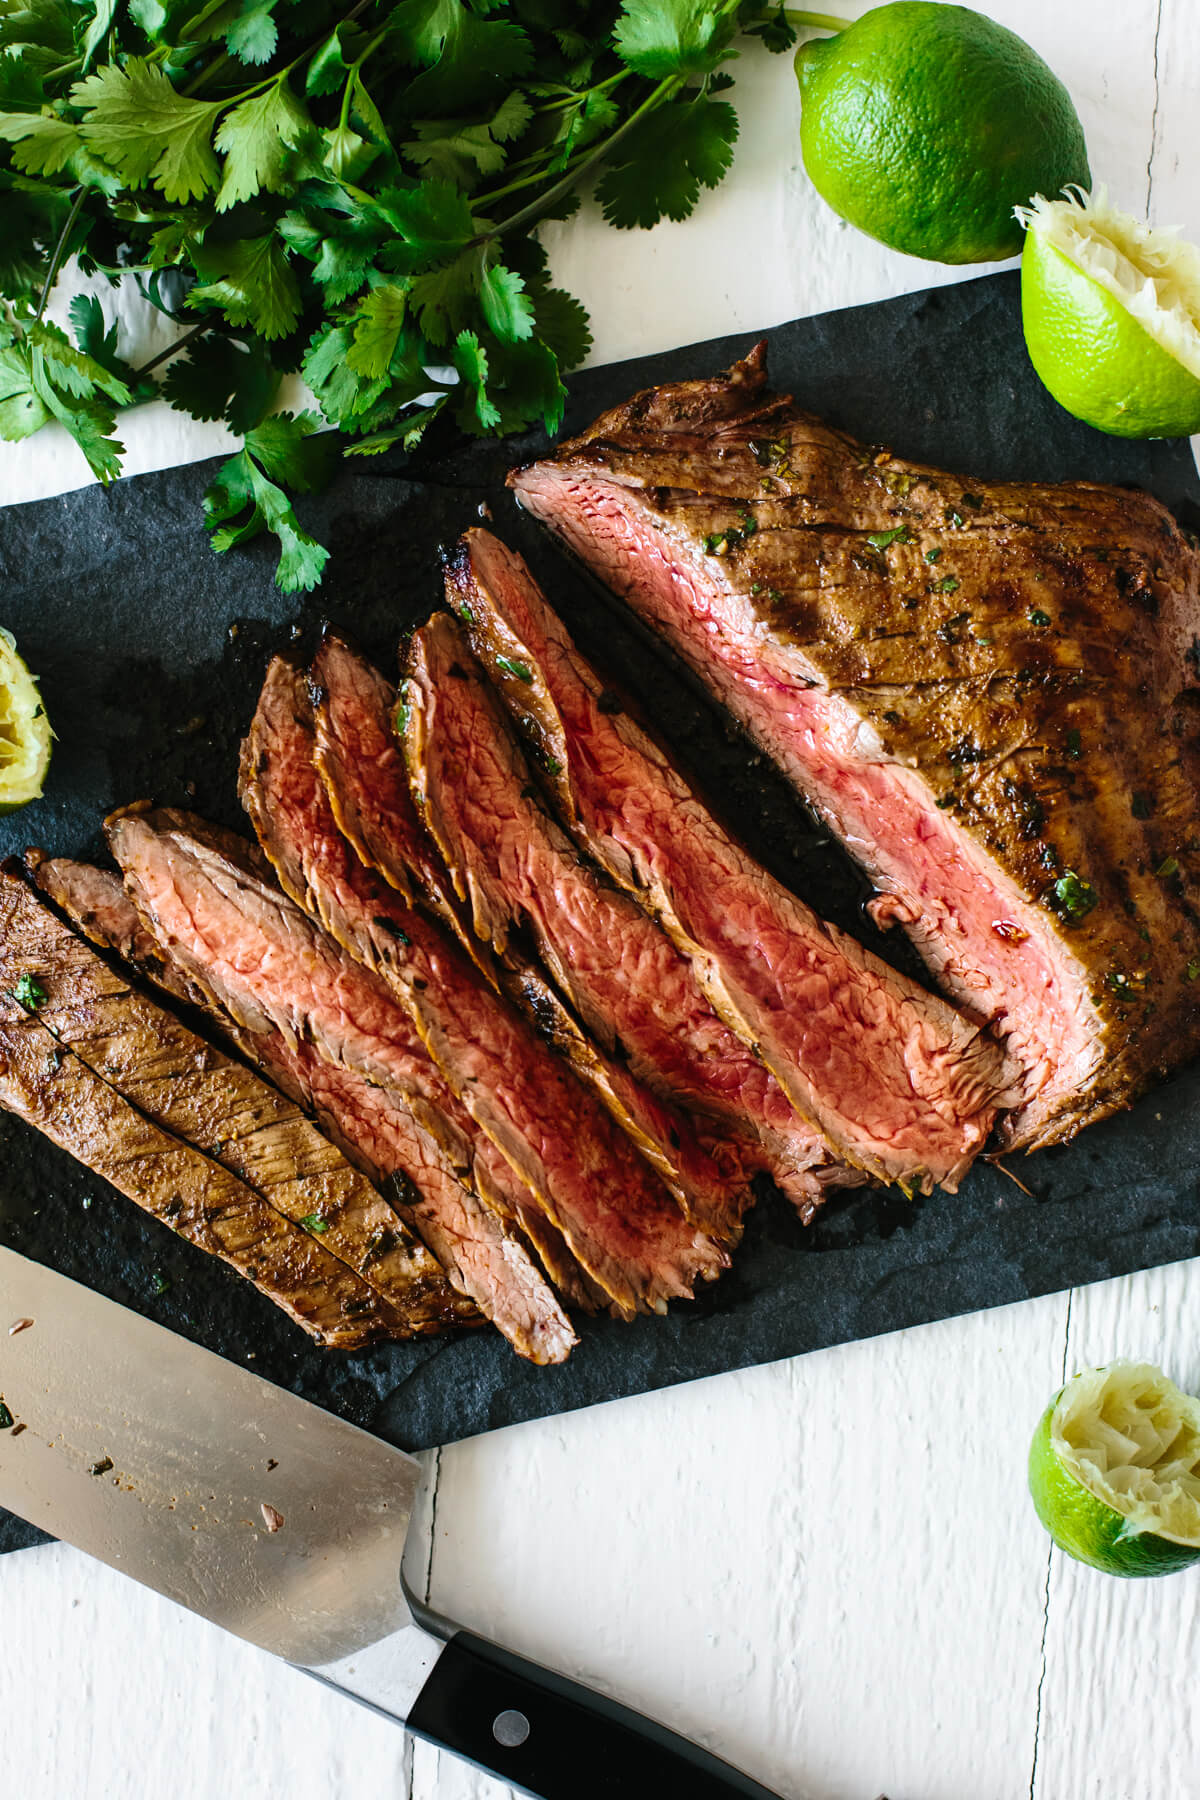 Carne asada sliced into pieces.